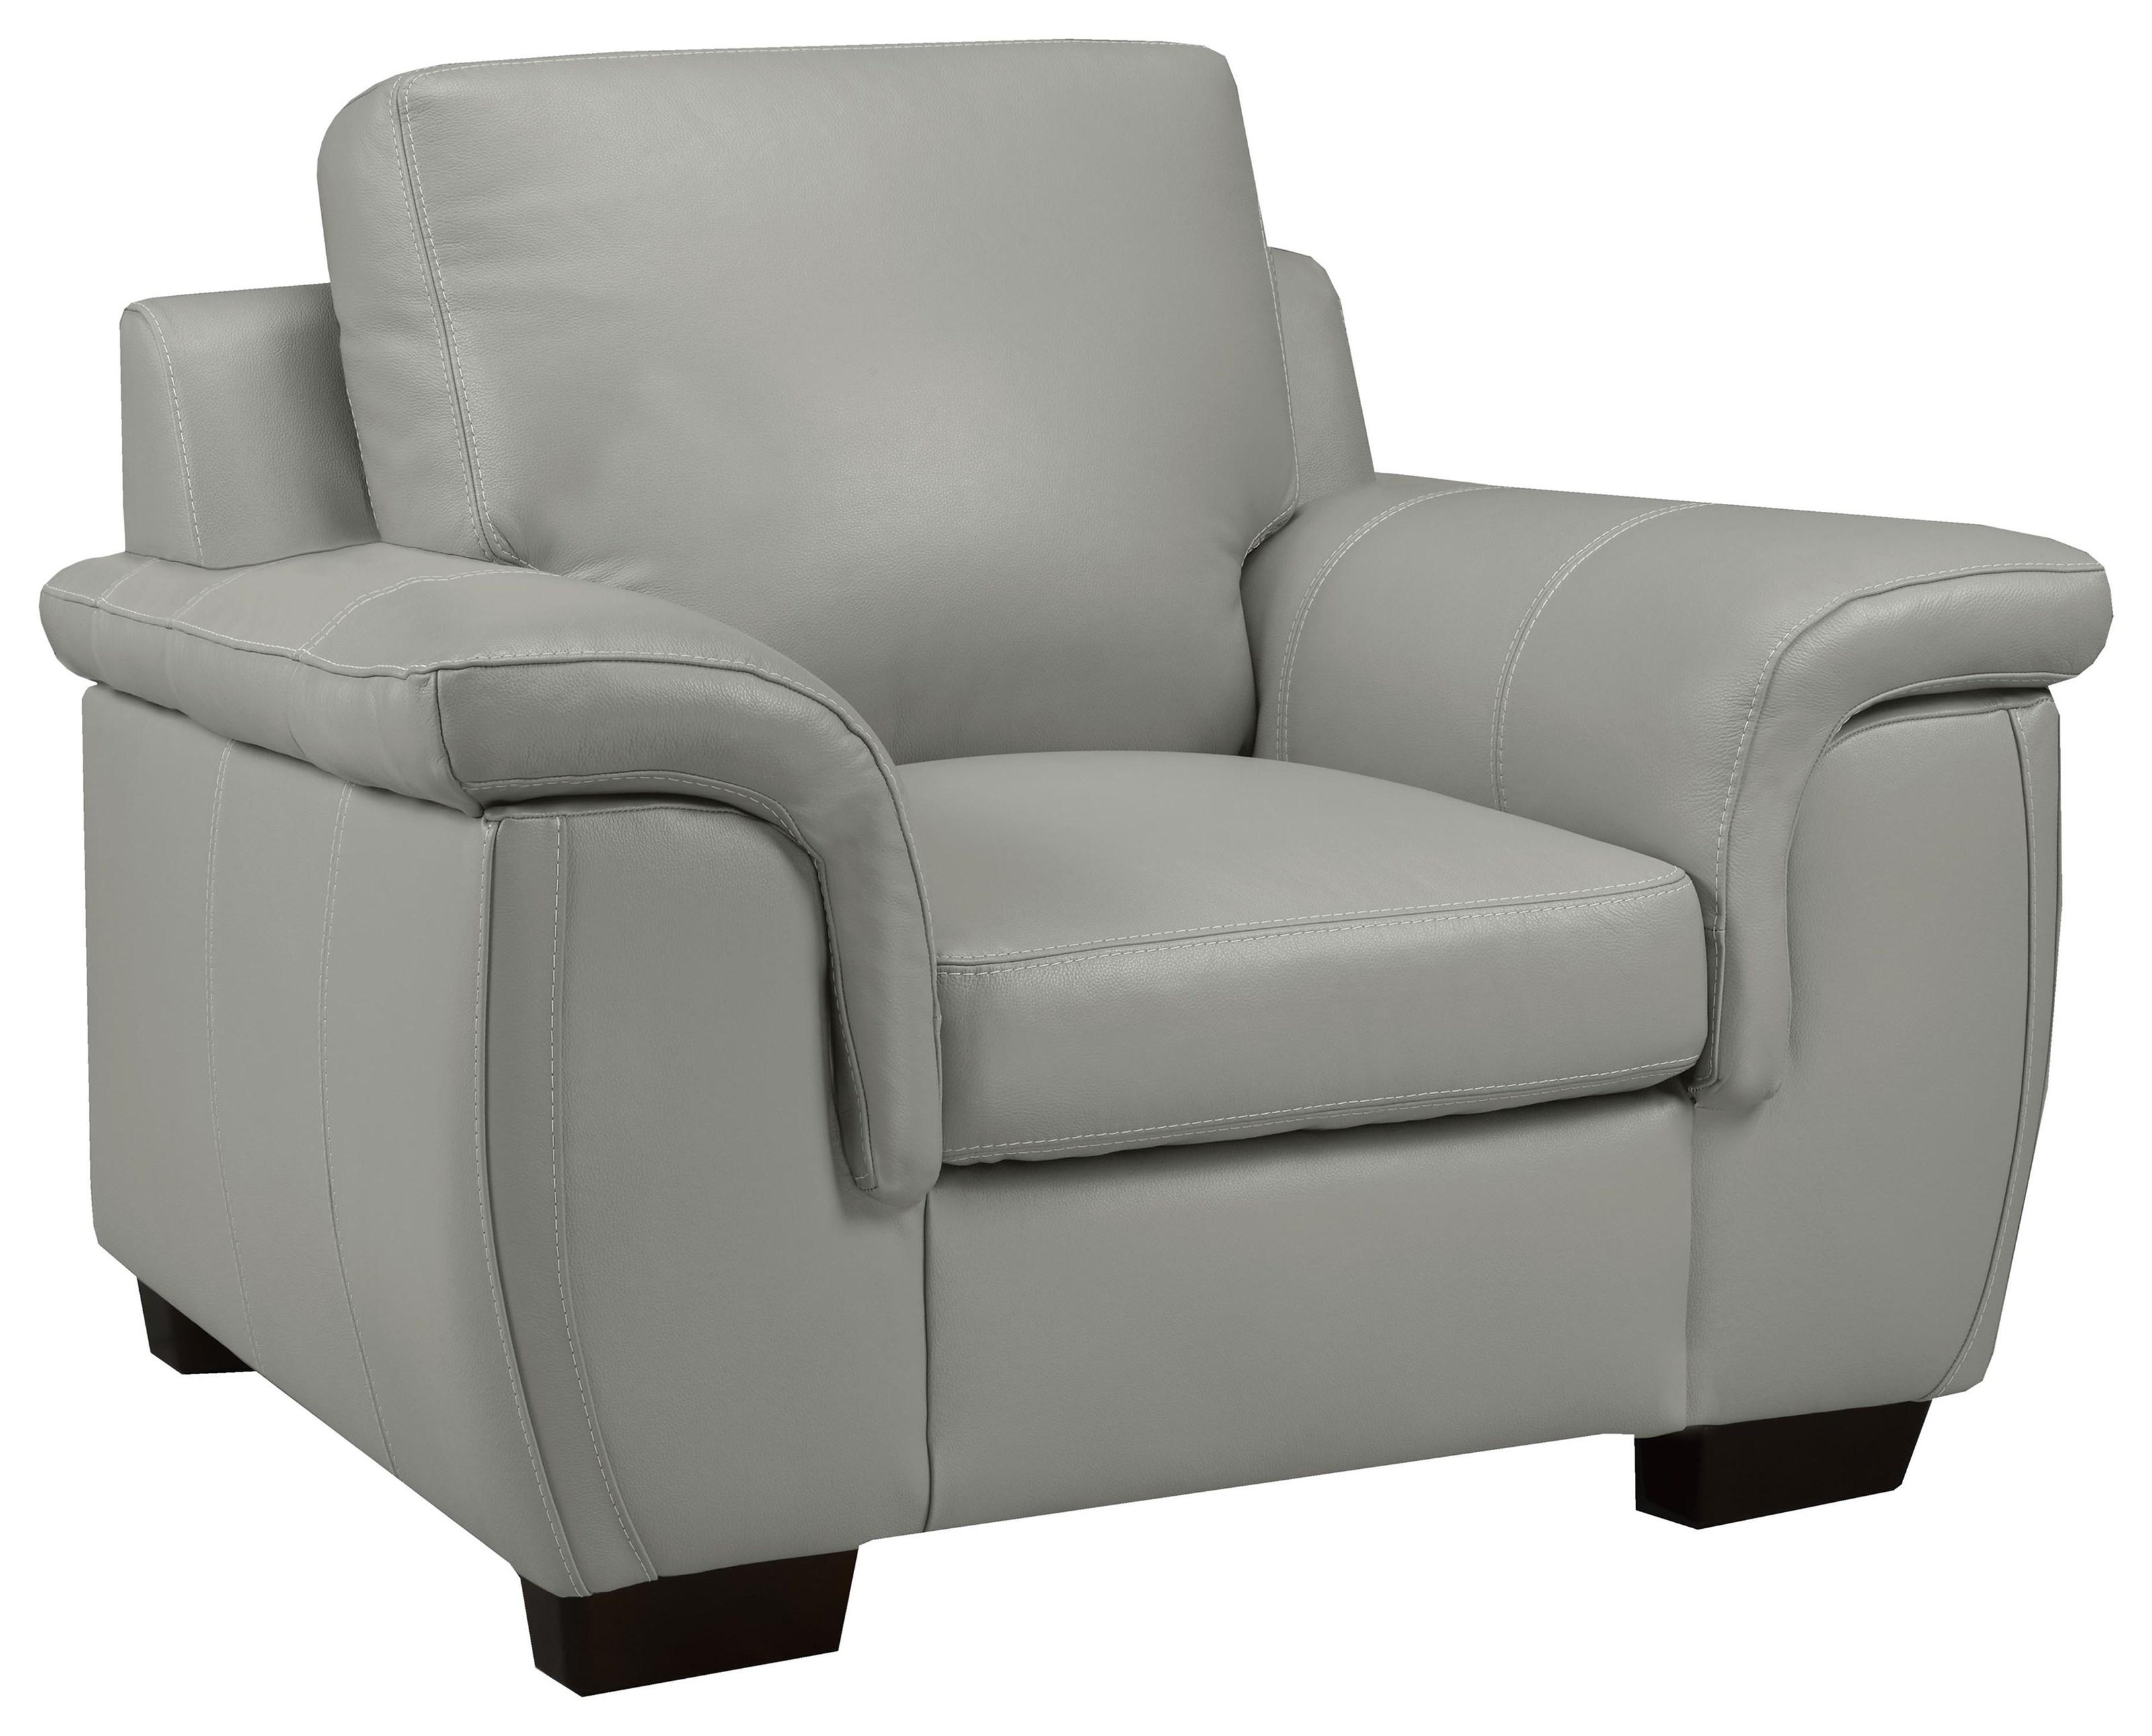 Chair - Lthr /cloud Gray Al